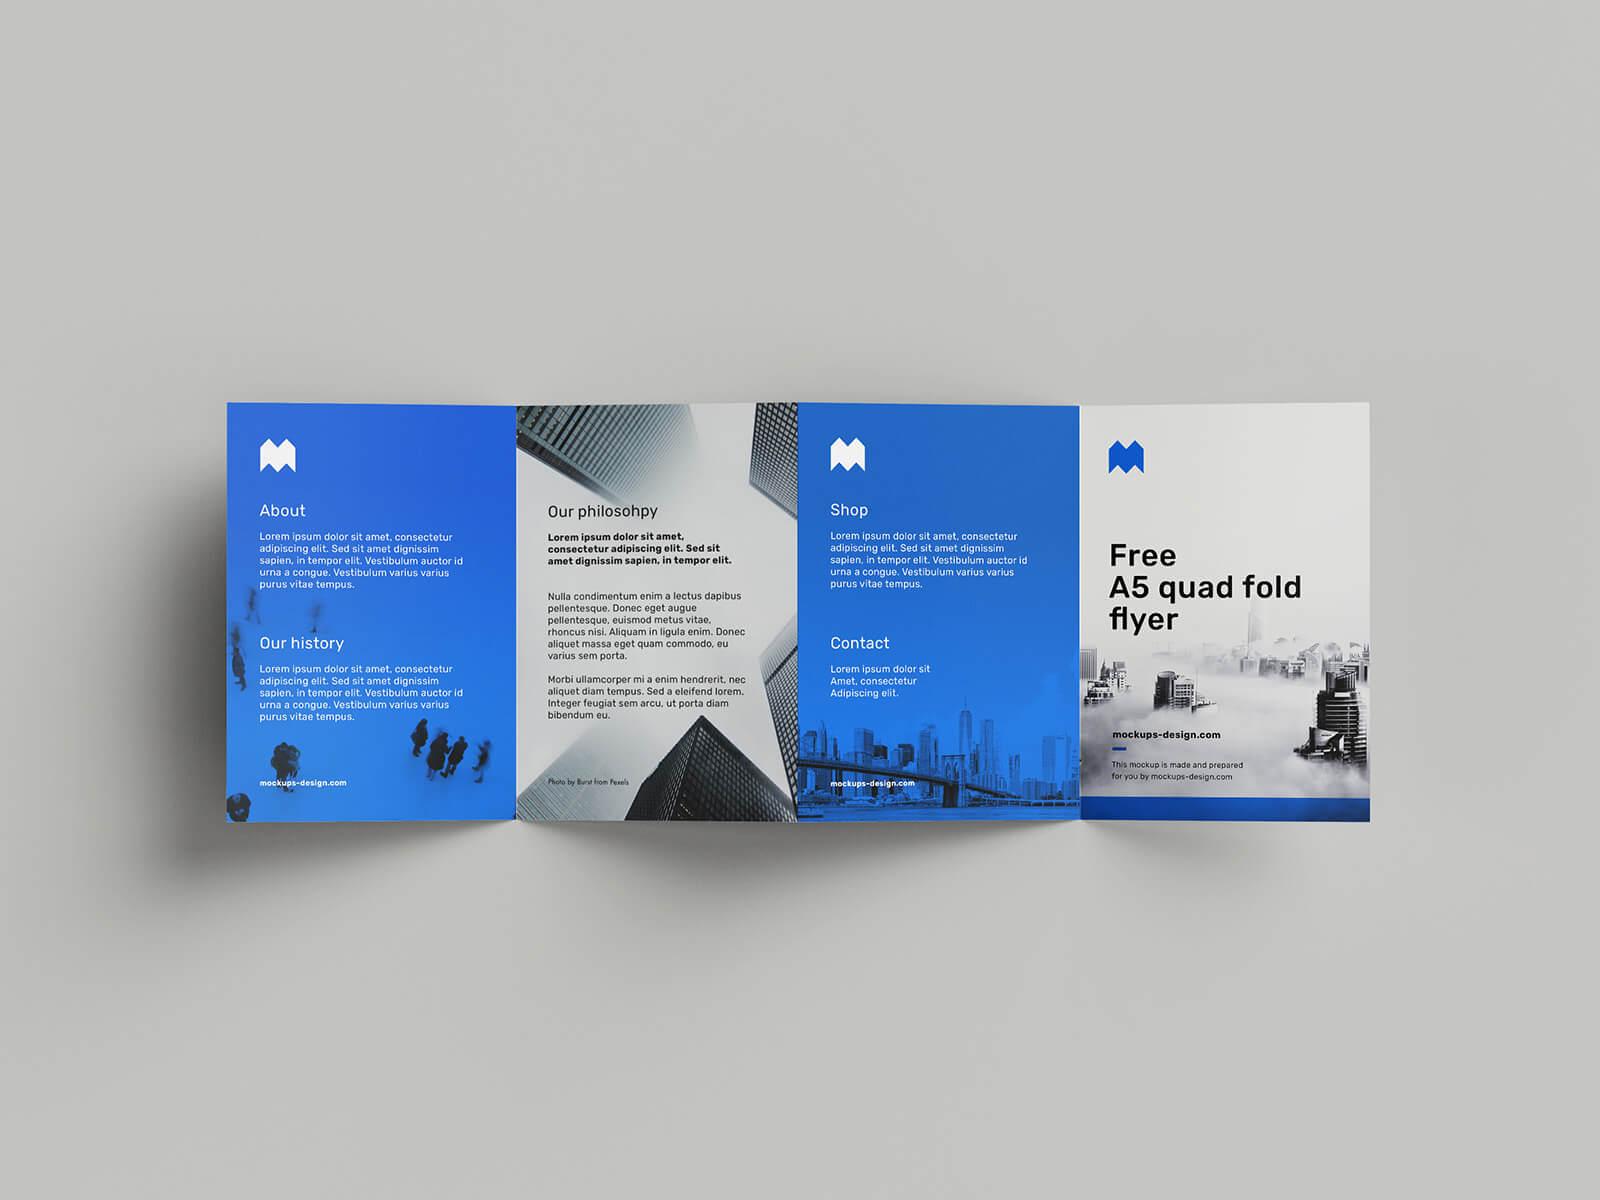 Free Blue A5 Quad Fold Flyer Mockup PSD Template2 (1)